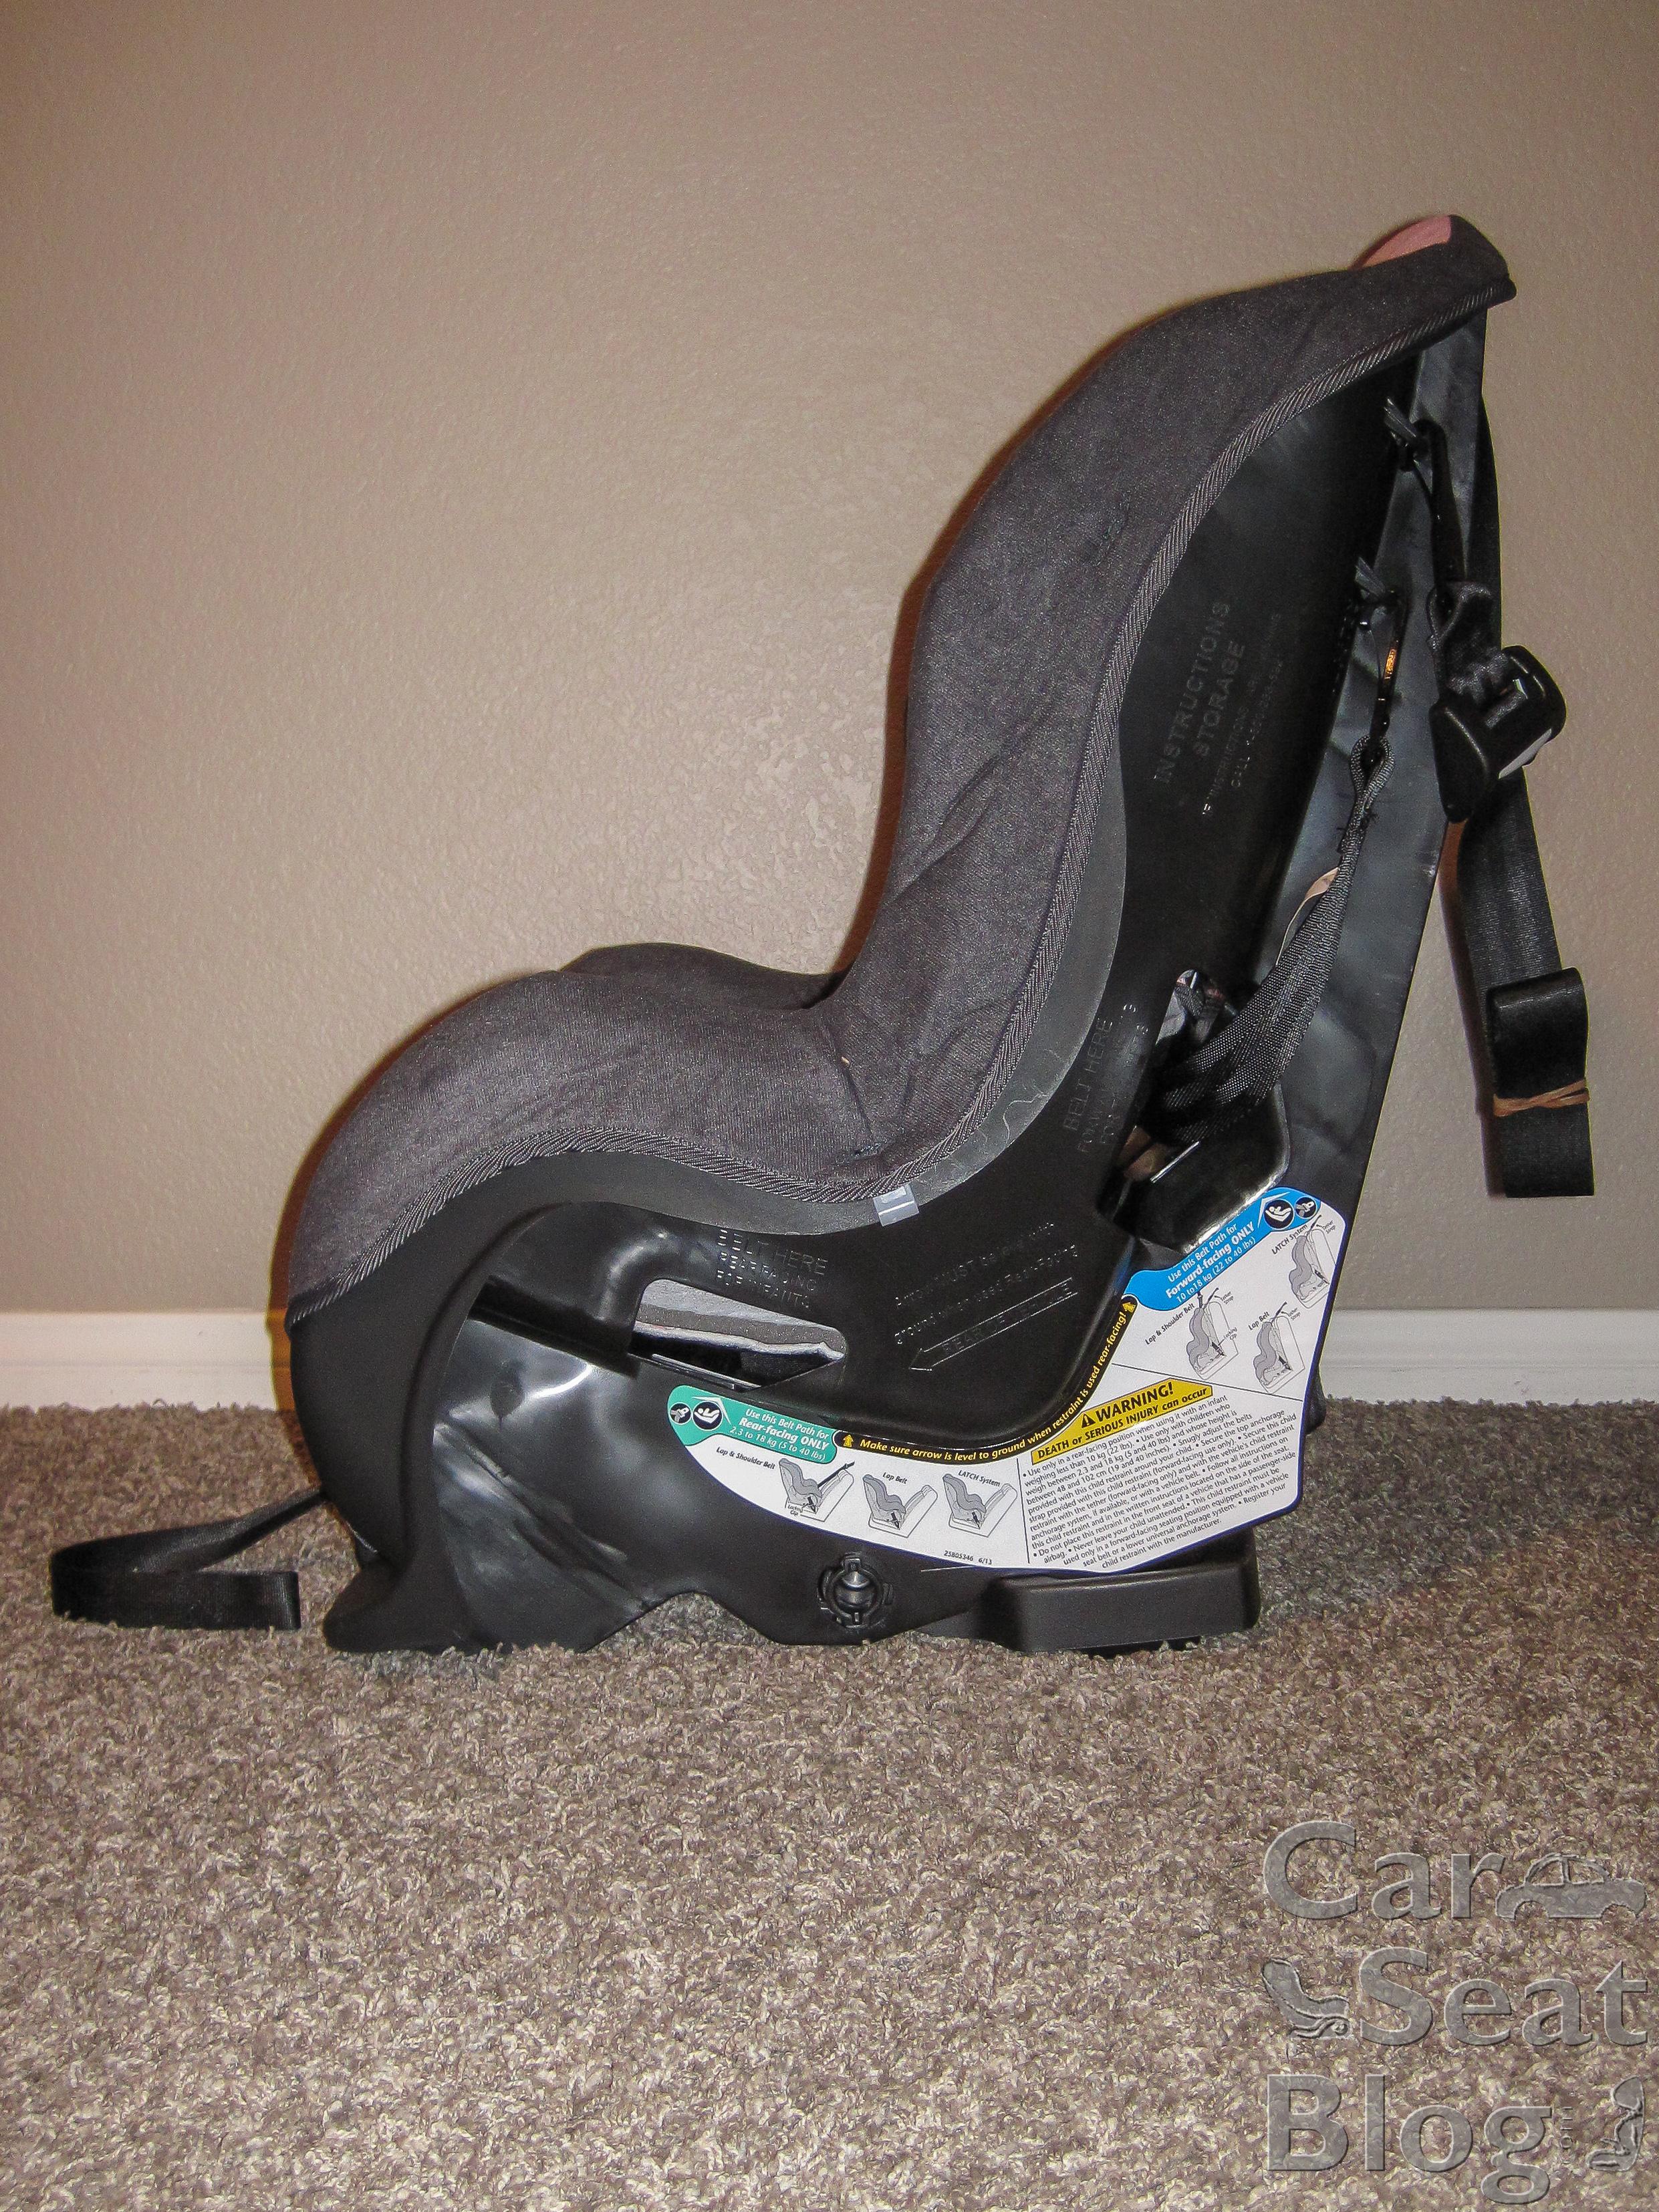 evenflo tribute car seat instructions velcromag. Black Bedroom Furniture Sets. Home Design Ideas